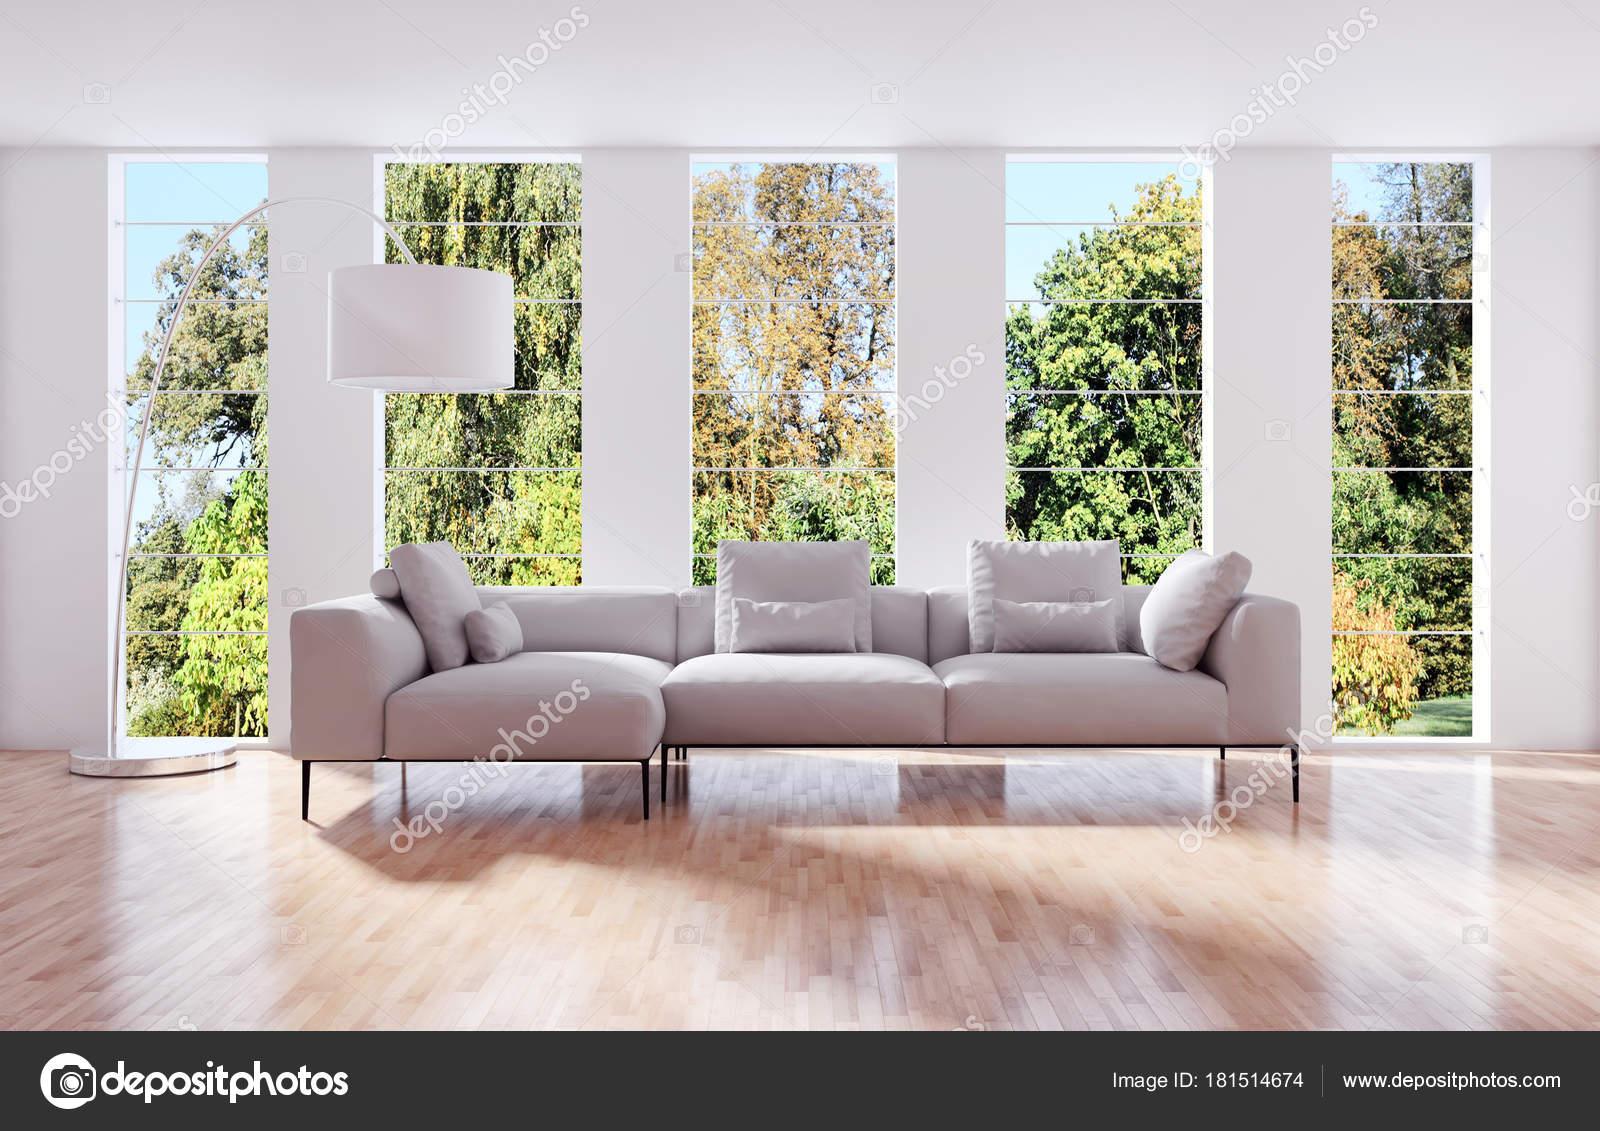 https://st3.depositphotos.com/15869754/18151/i/1600/depositphotos_181514674-stockafbeelding-moderne-interieurs-3d-rendering-illustratie.jpg